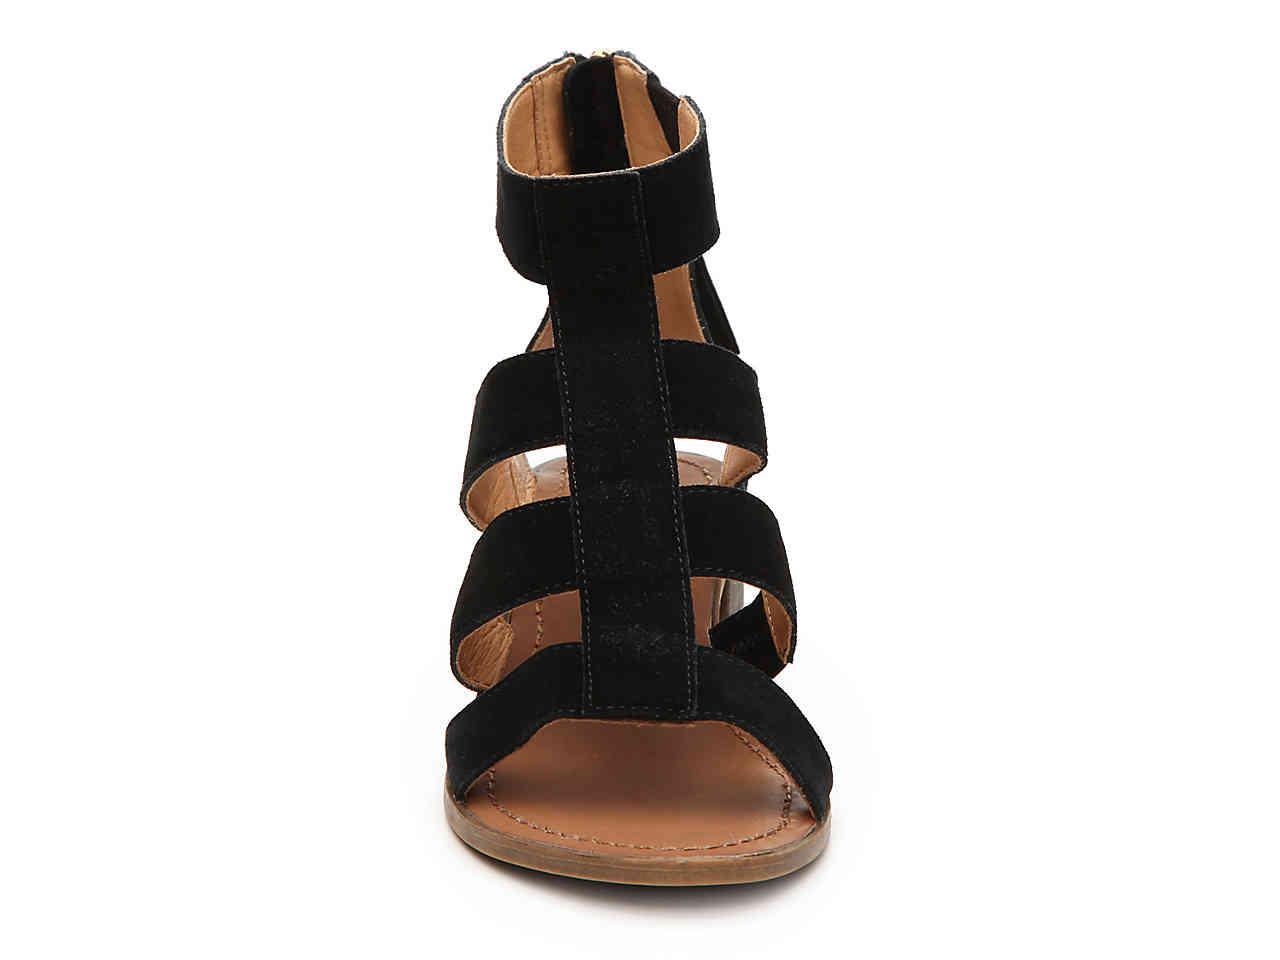 9686cc3f104f Lyst - Steve Madden Daviss Gladiator Sandal in Black